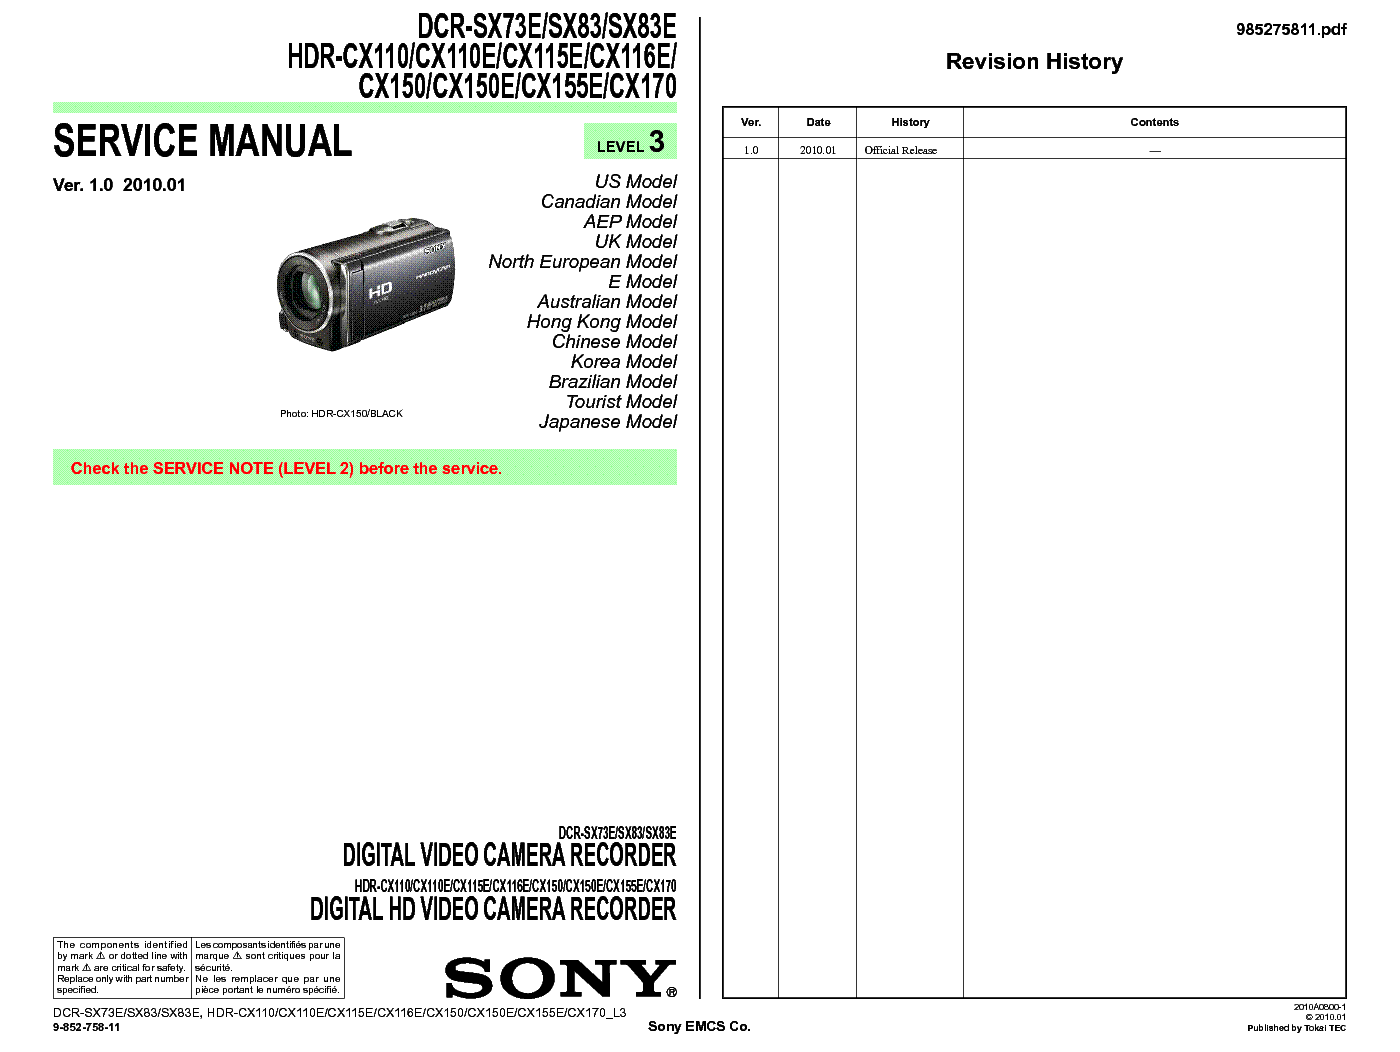 sony handycam hdr cx150 service manual Array - sony dcr sx73 sx83 hdr cx110  cx115 cx116 cx150 cx155 cx170 level3 rh elektrotanya